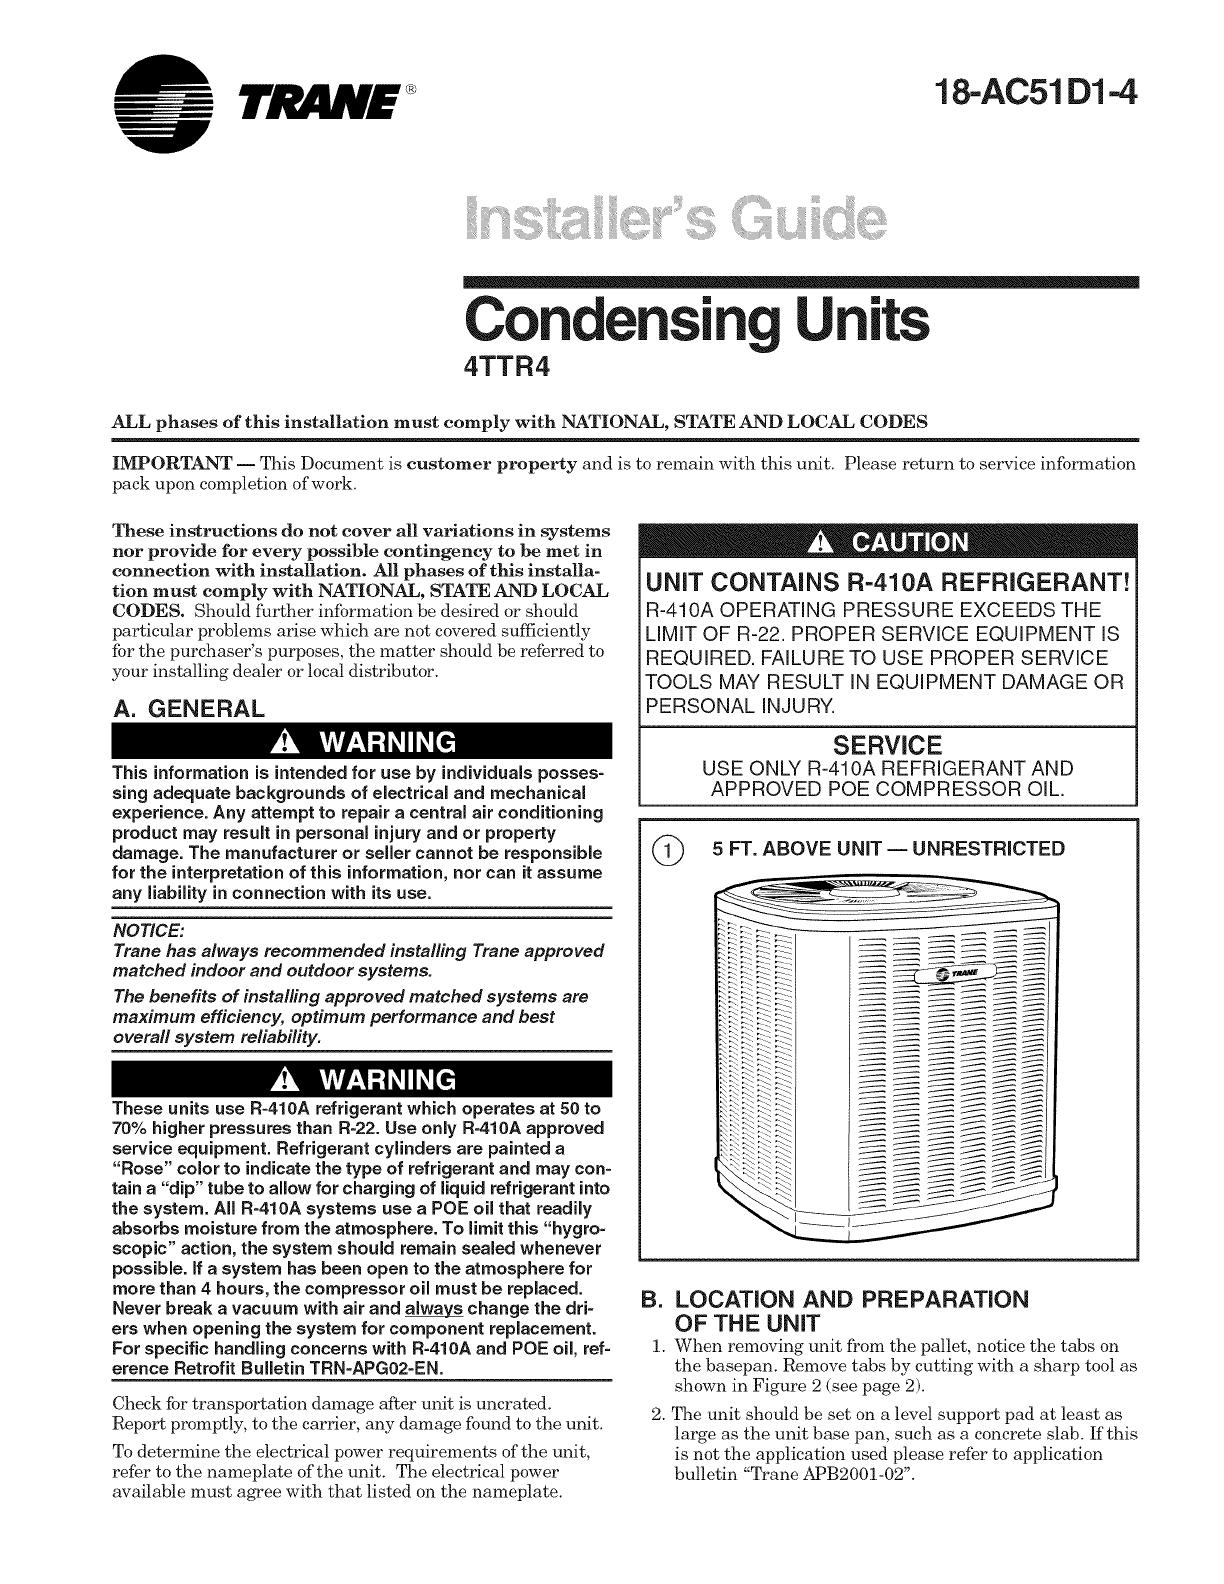 TRANE Air Conditioner/heat Pump(outside Unit) Manual L0905060